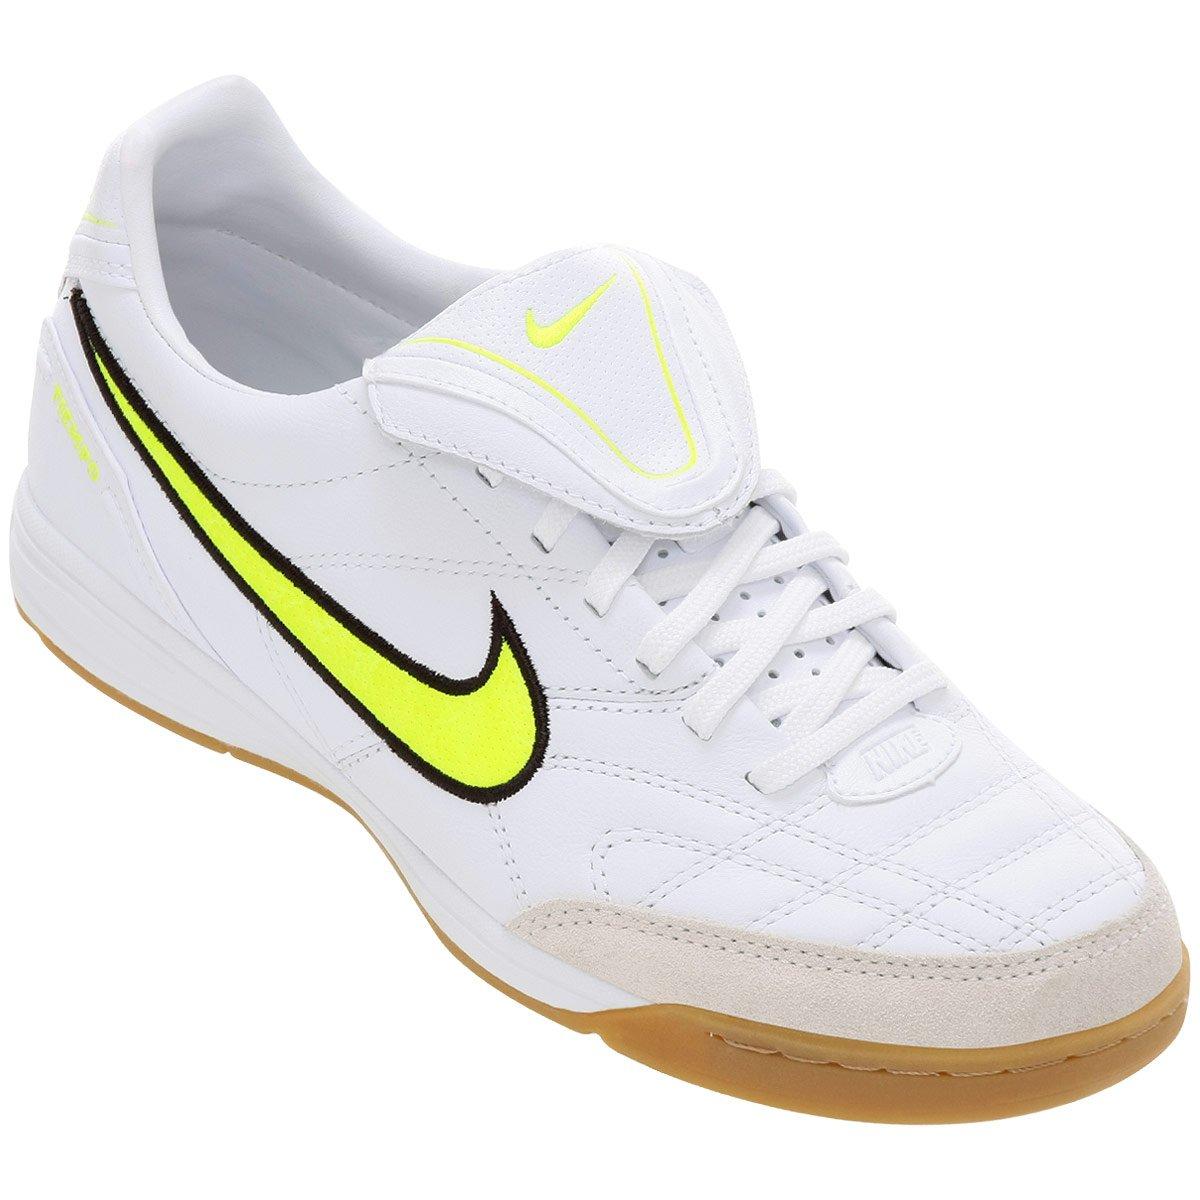 608274db15 Chuteira Nike Tiempo Mystic 3 IC - Compre Agora